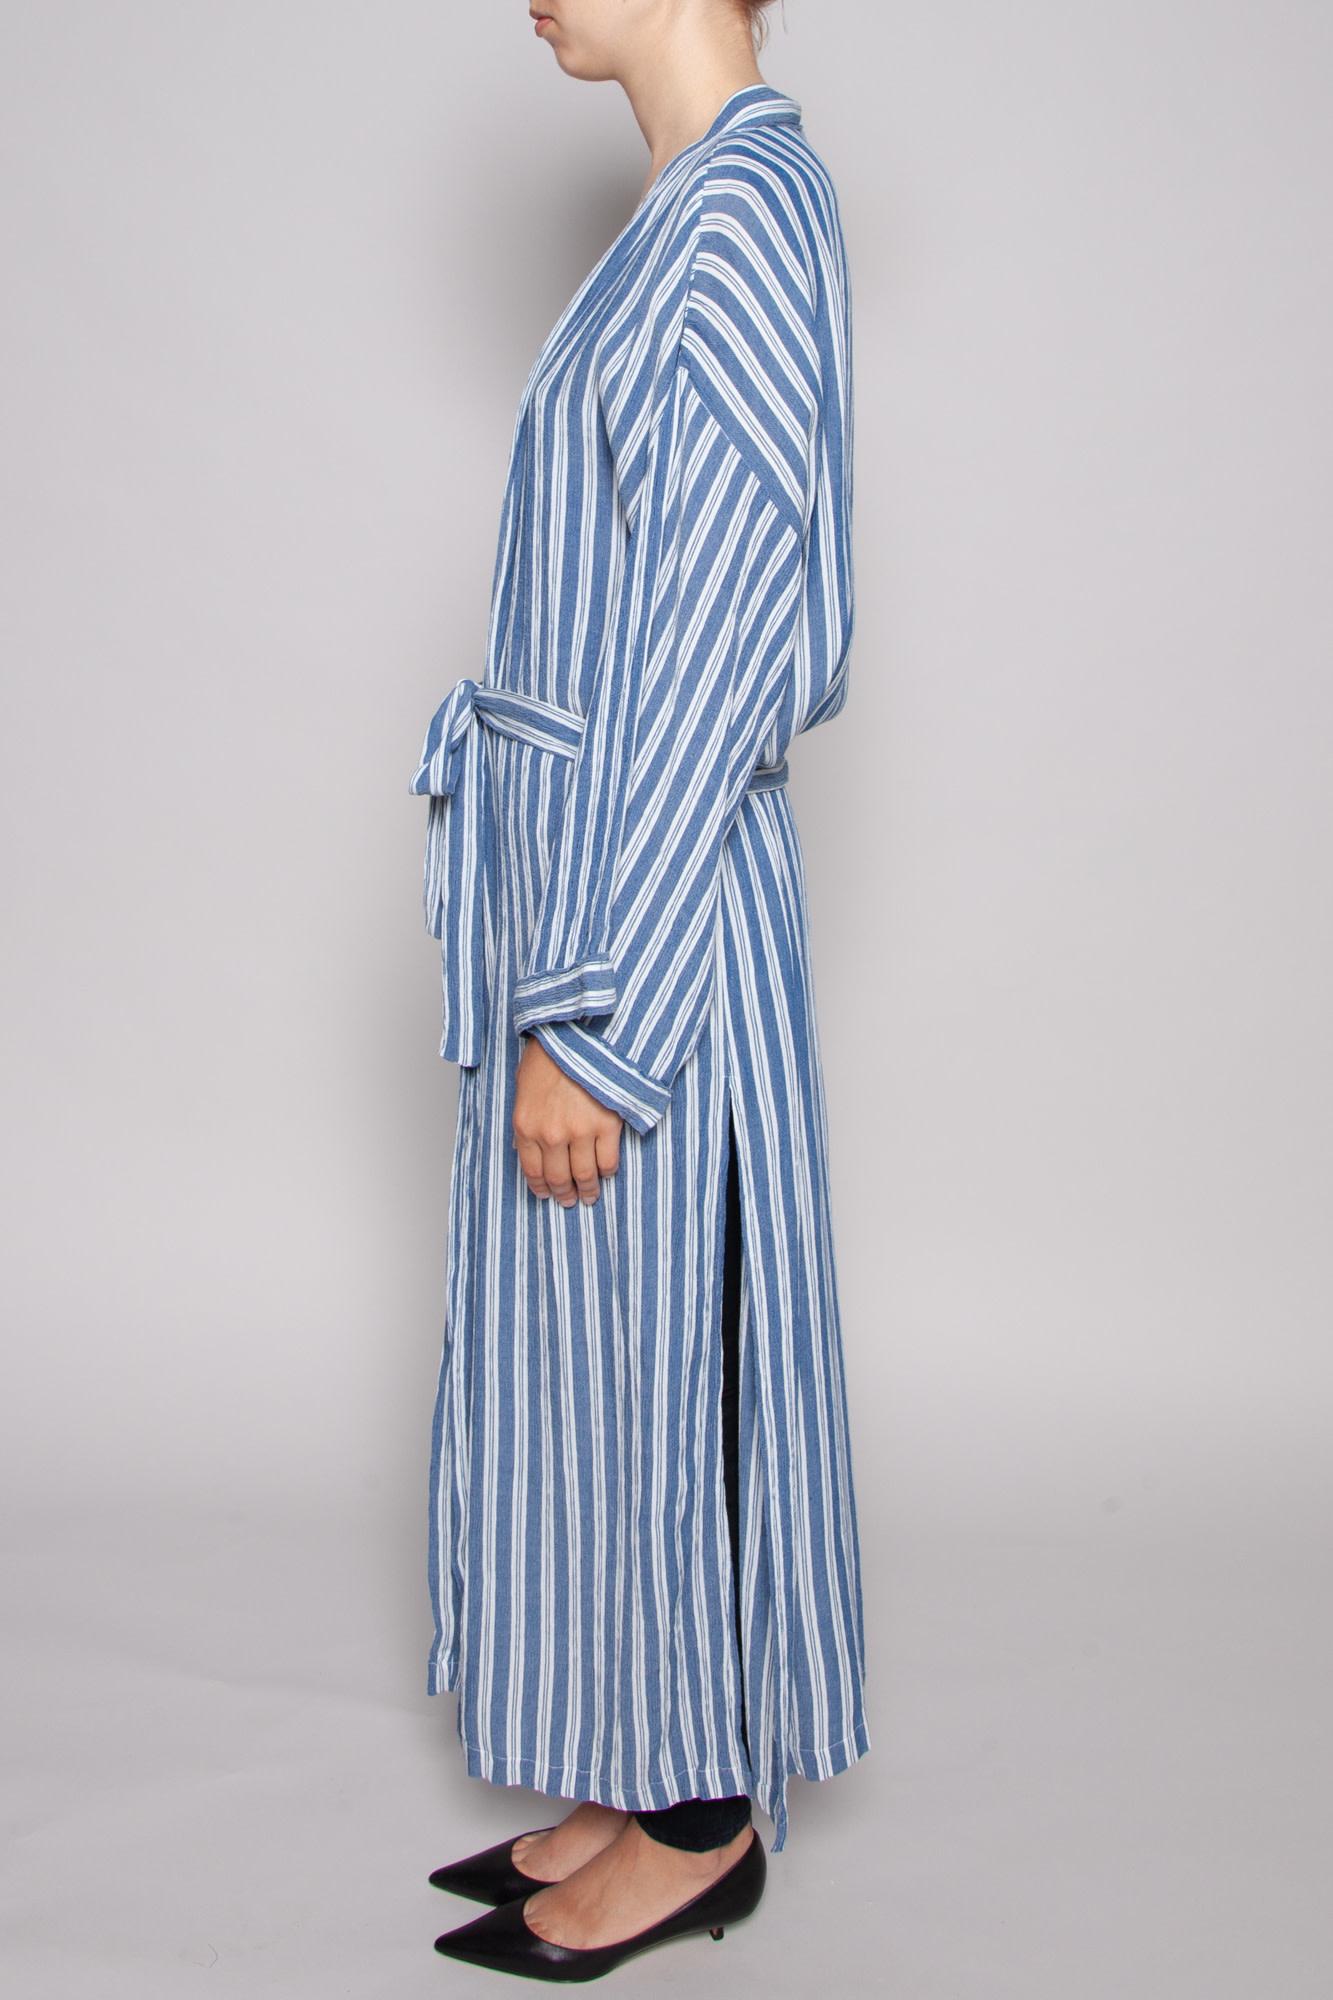 Elan BLUE AND WHITE STRIPED KIMONO WITH SIDE SLITS - NEW